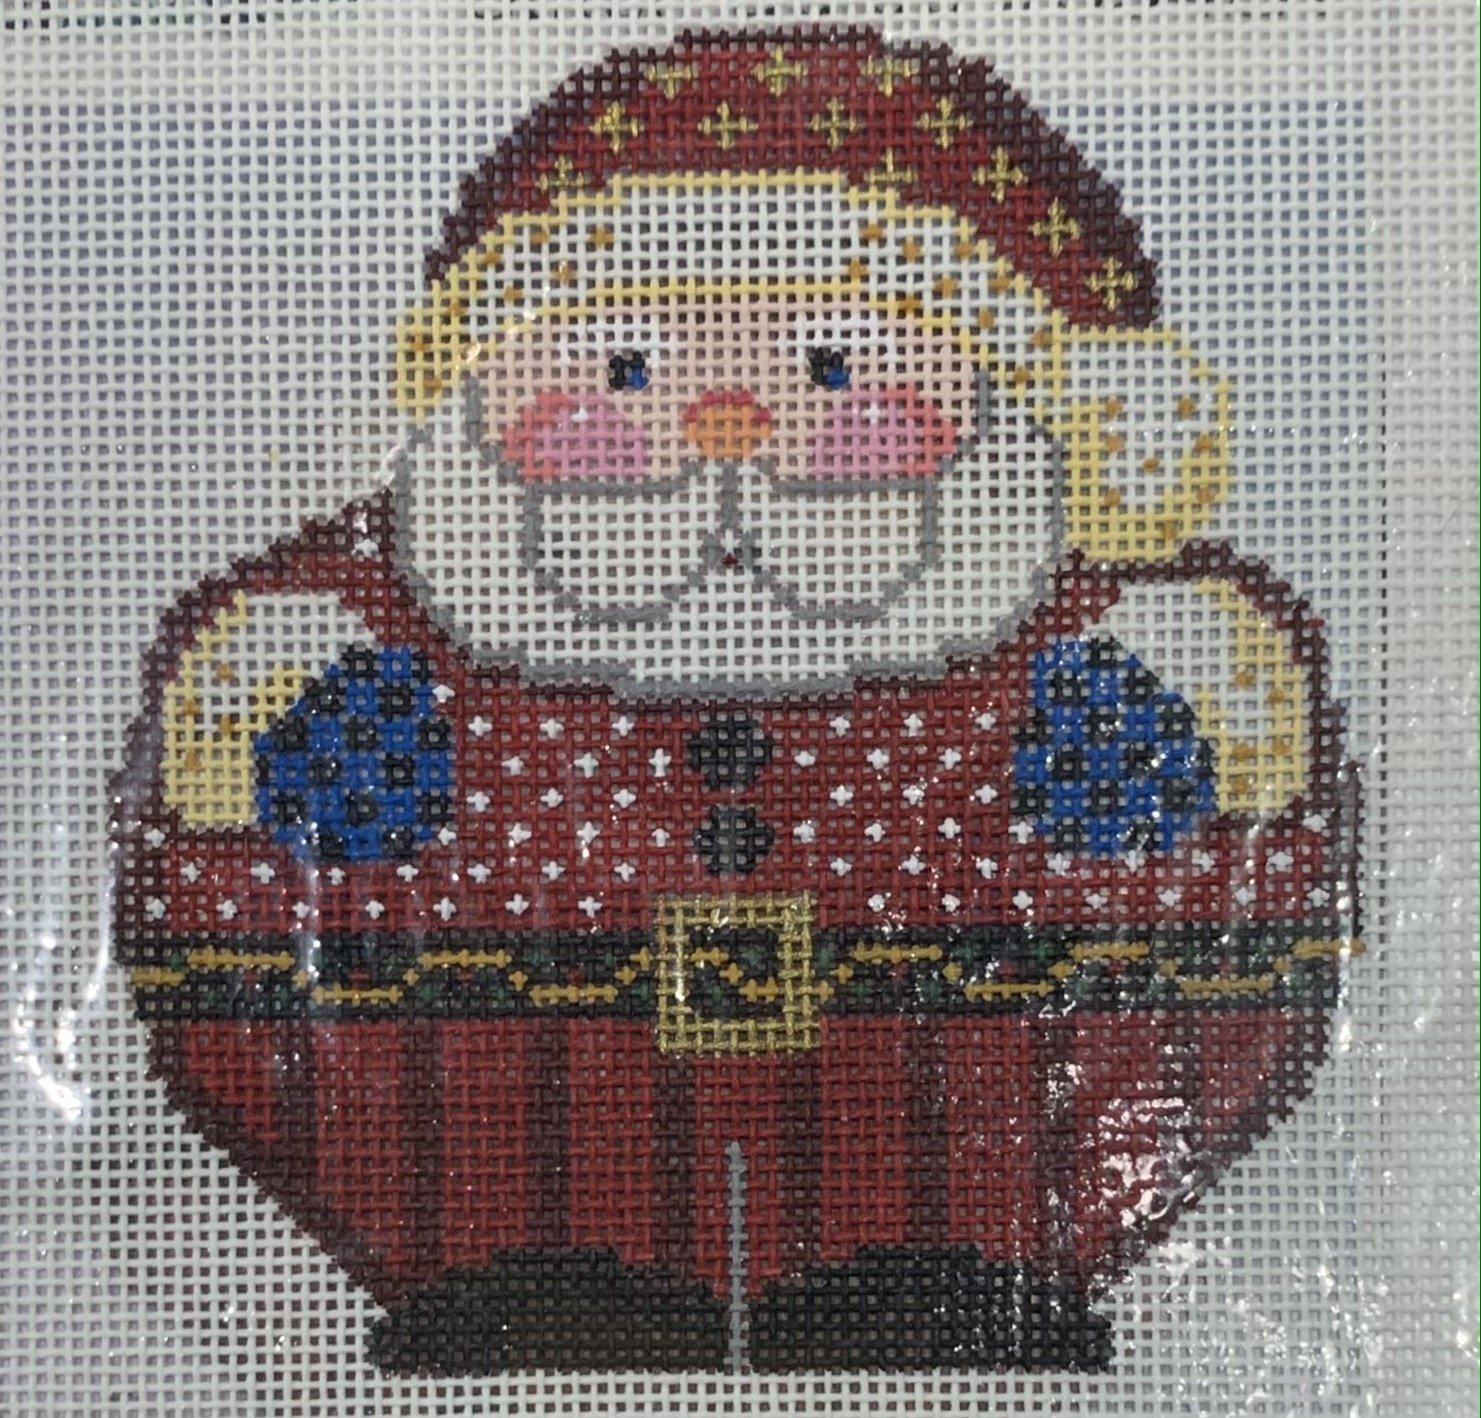 Portly Santa